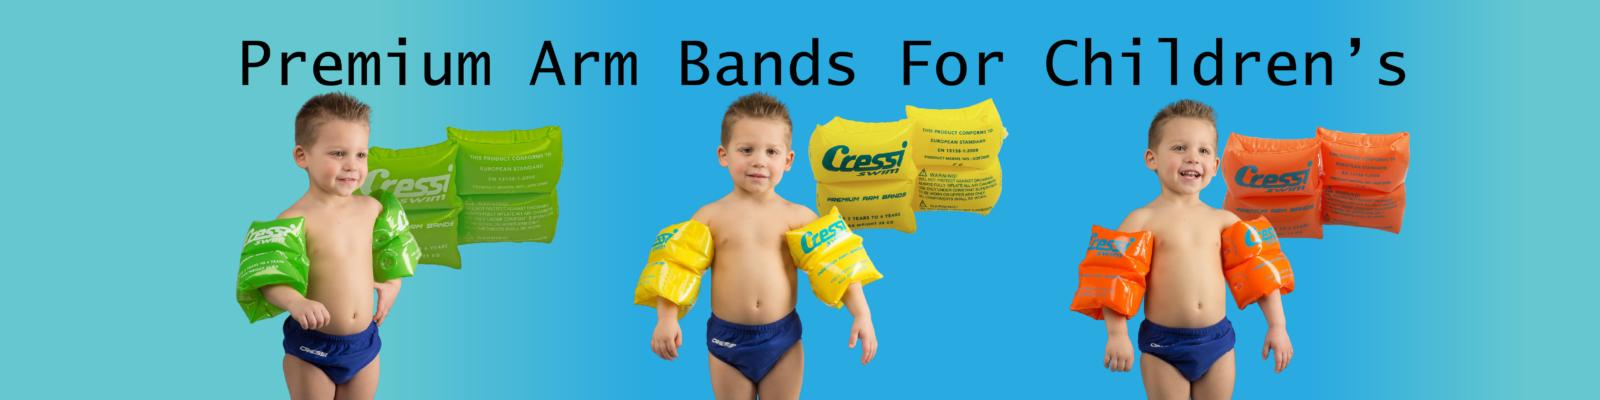 Premium Arm Bands For Children